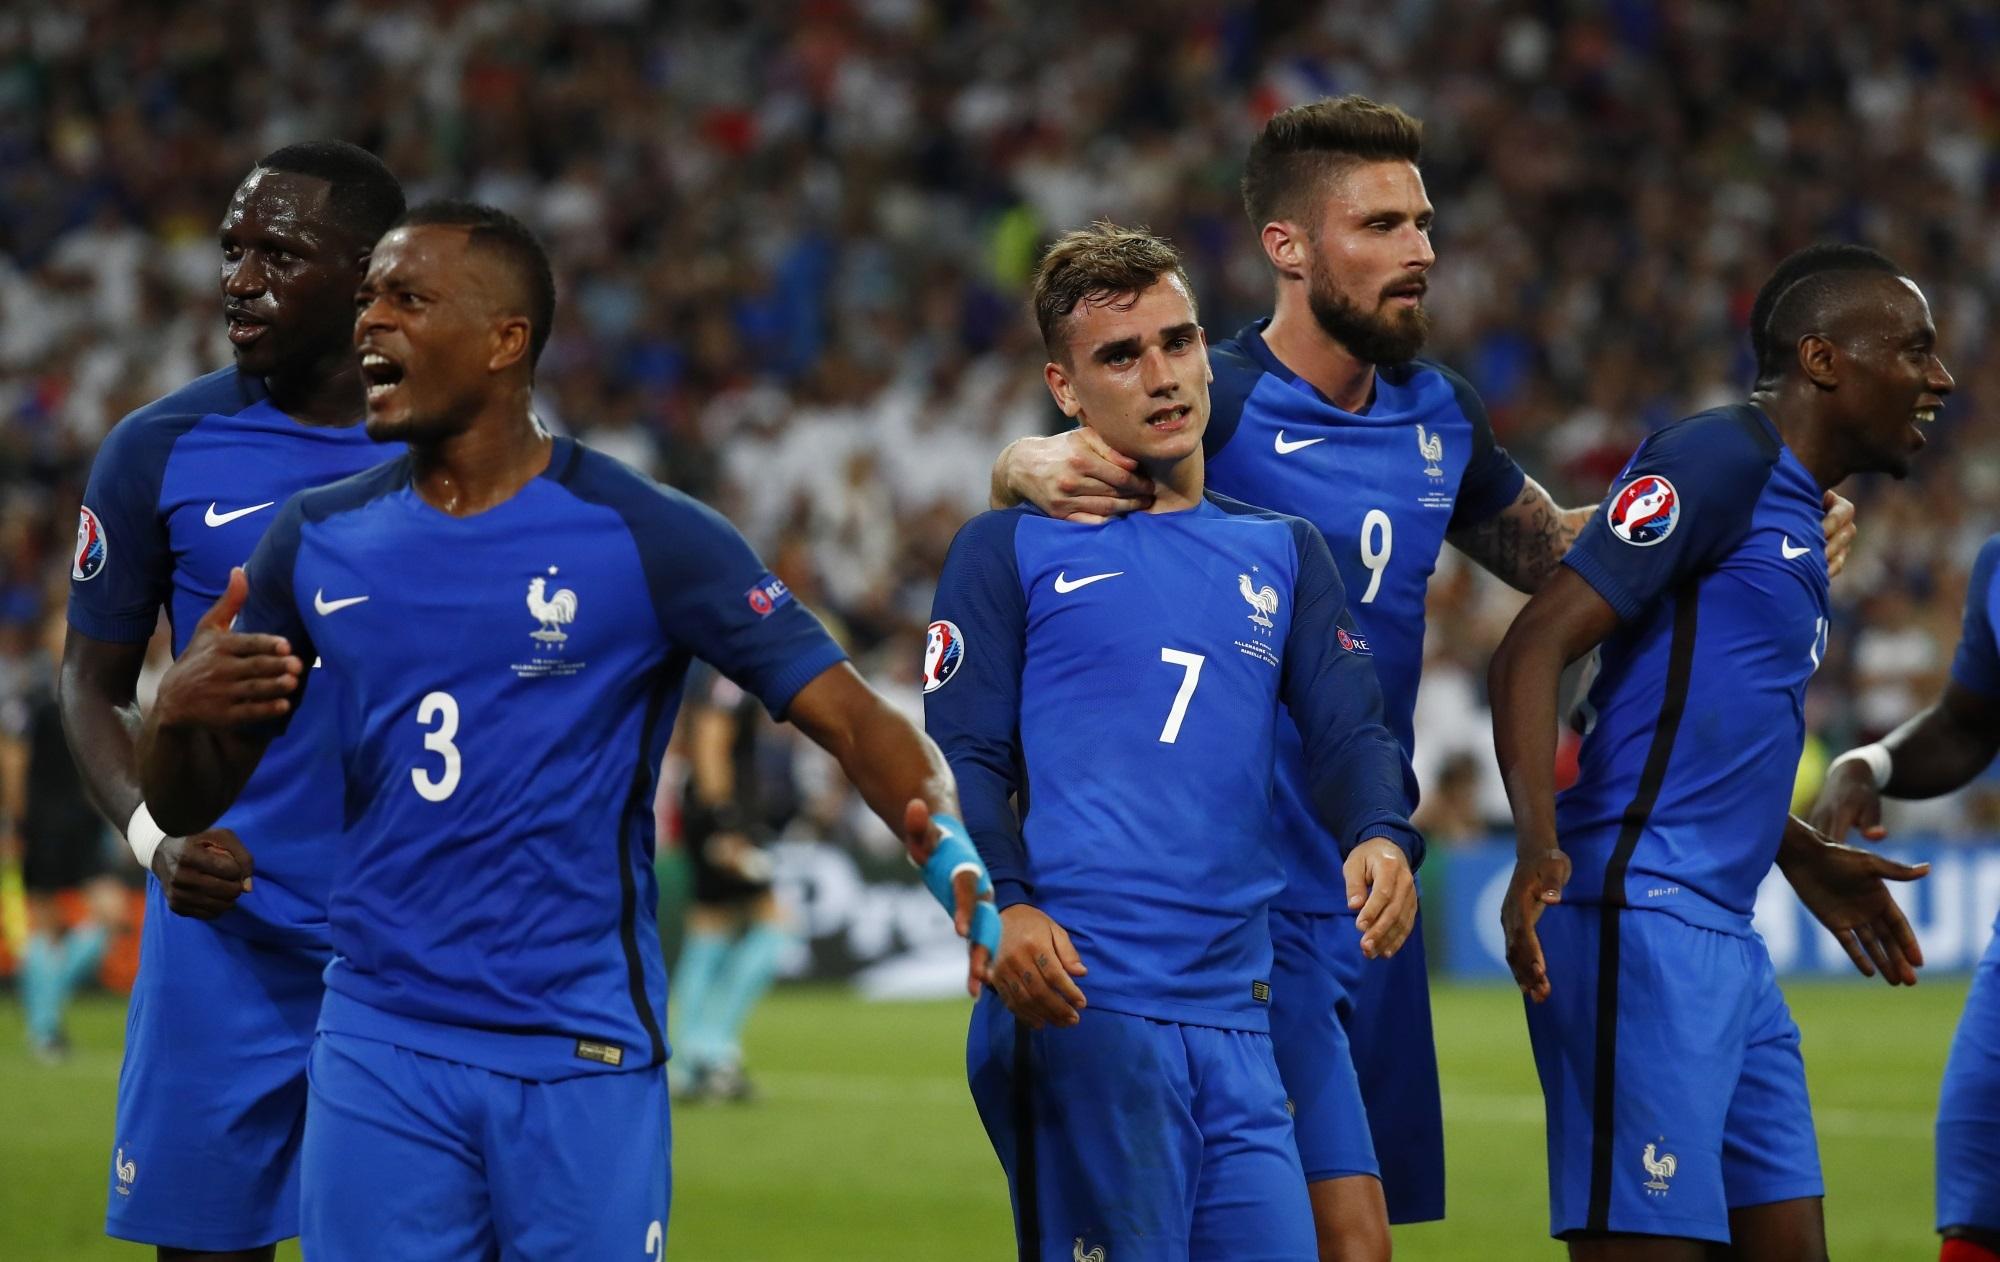 Франция – Бельгия. Прогноз на матч 10 июля 2018 Чемпионат Мира 2018